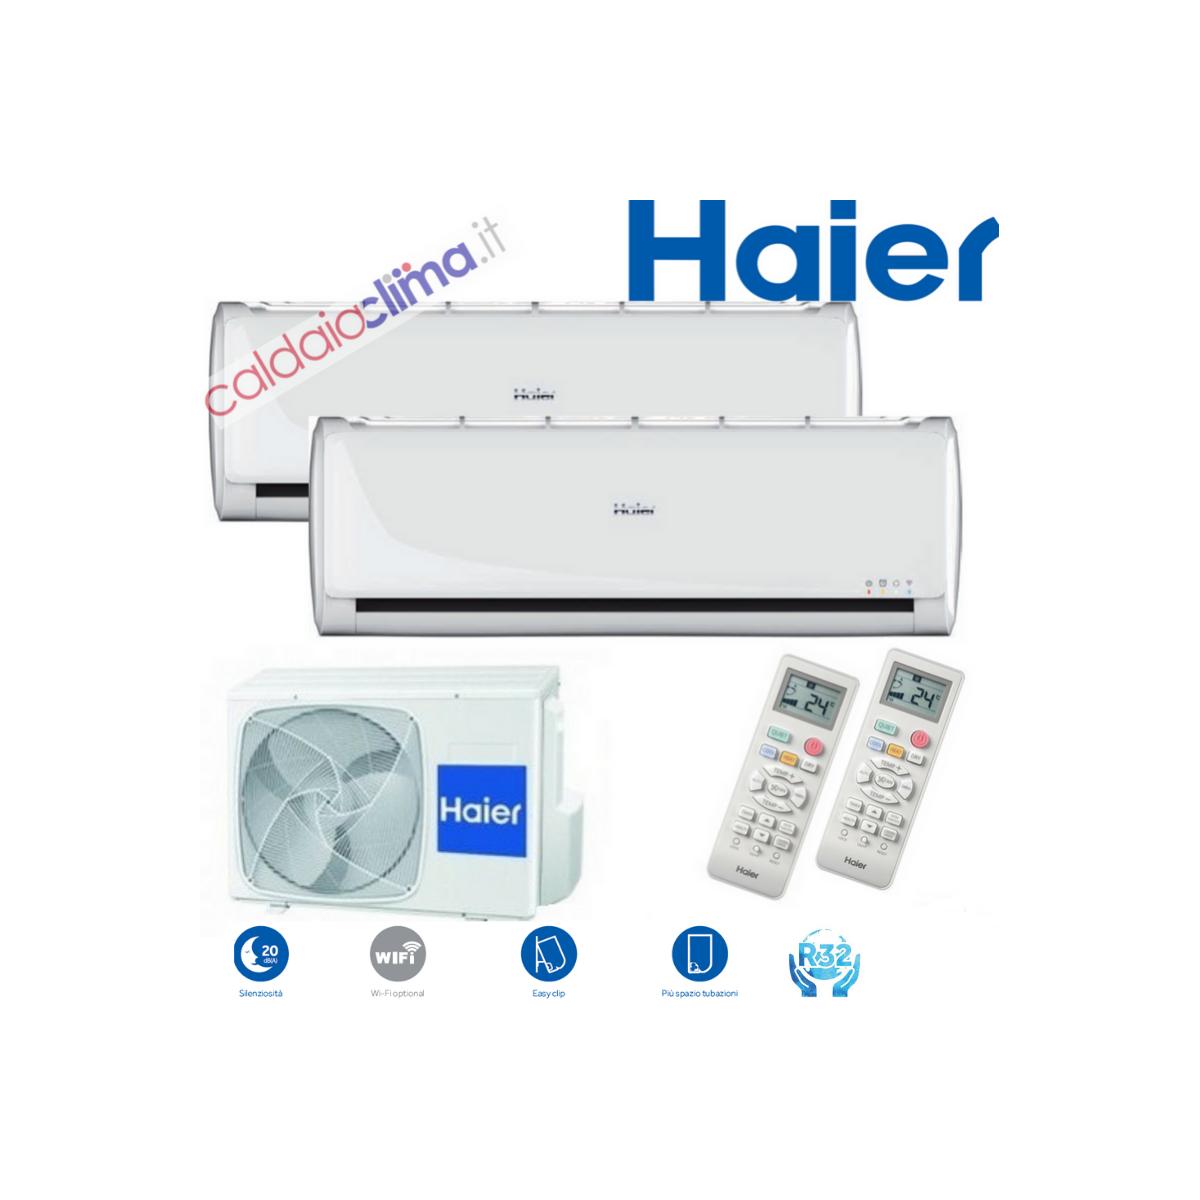 Climatizzatore Haier Dualsplit TUNDRA 2.0 2U40 -  9000+12000 btu